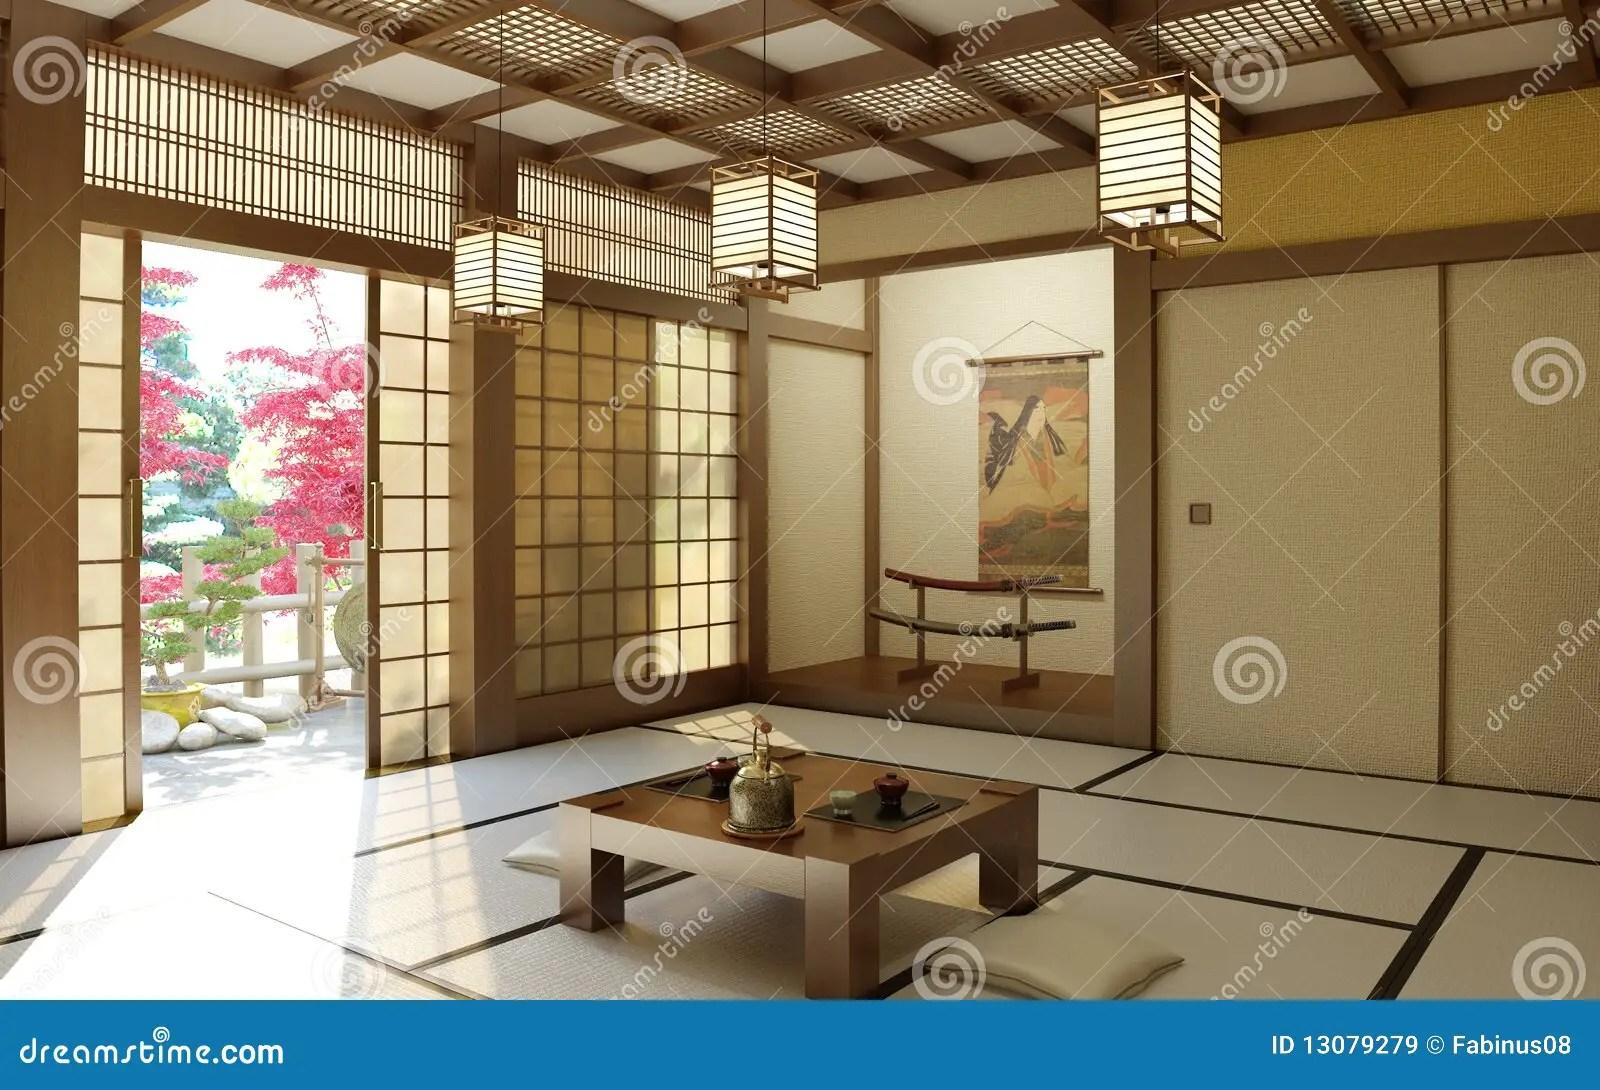 Japanese zen room stock image Image of inside buddhist